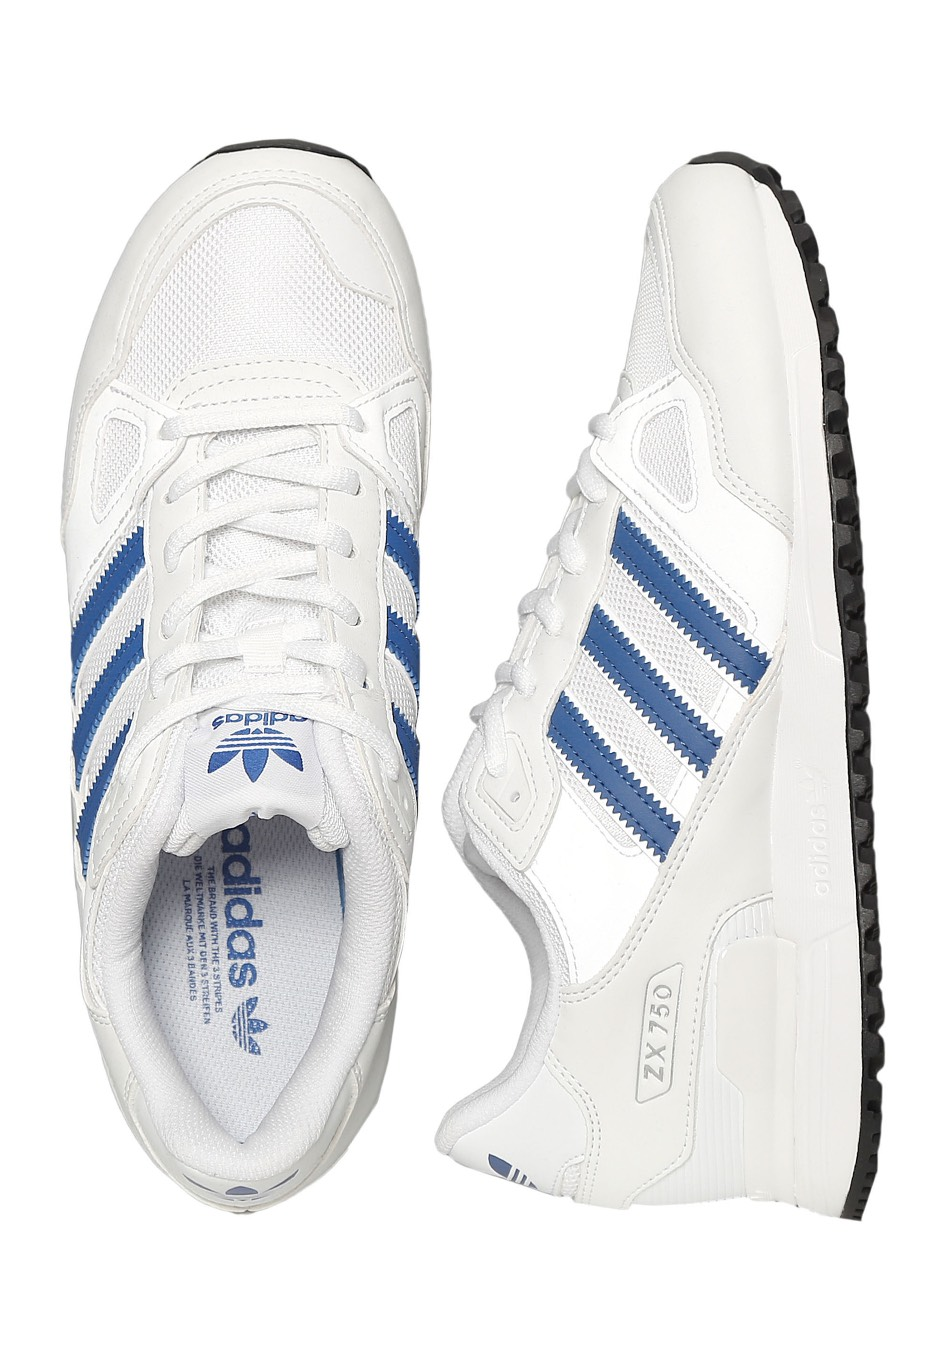 a55eb10db0b Sale Shoes - Specials - Merchandise